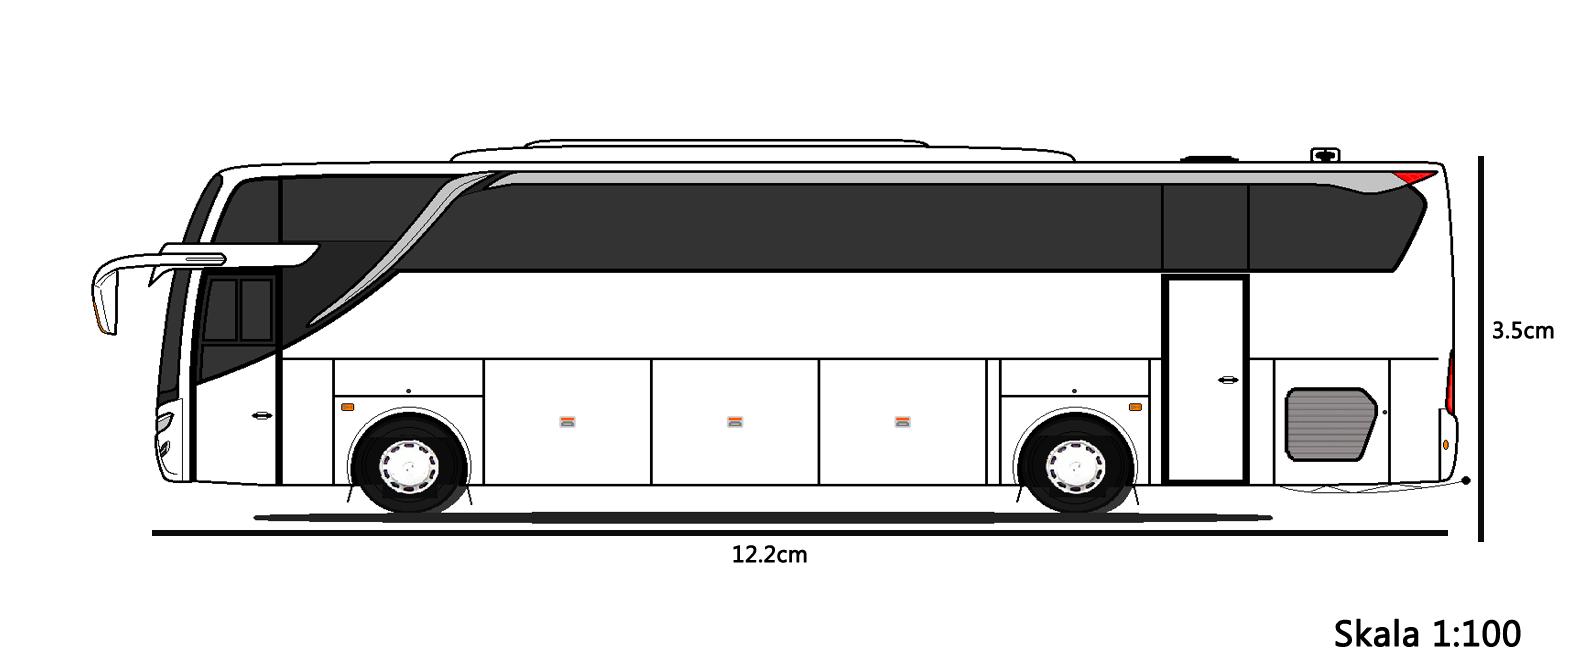 Ukuran Skala Miniatur Bus Shd